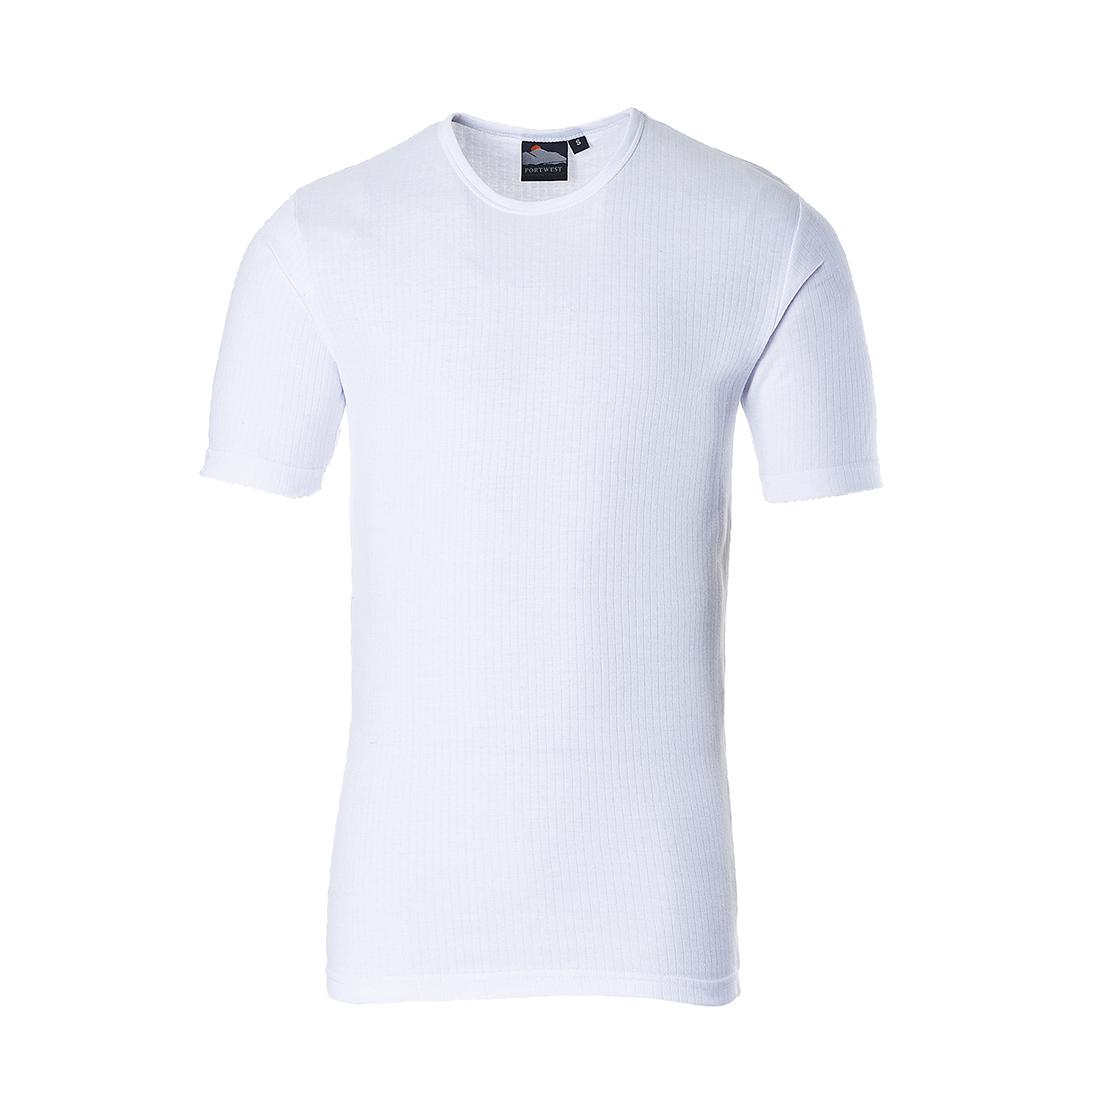 Thermal T-Shirt S/S White XLR